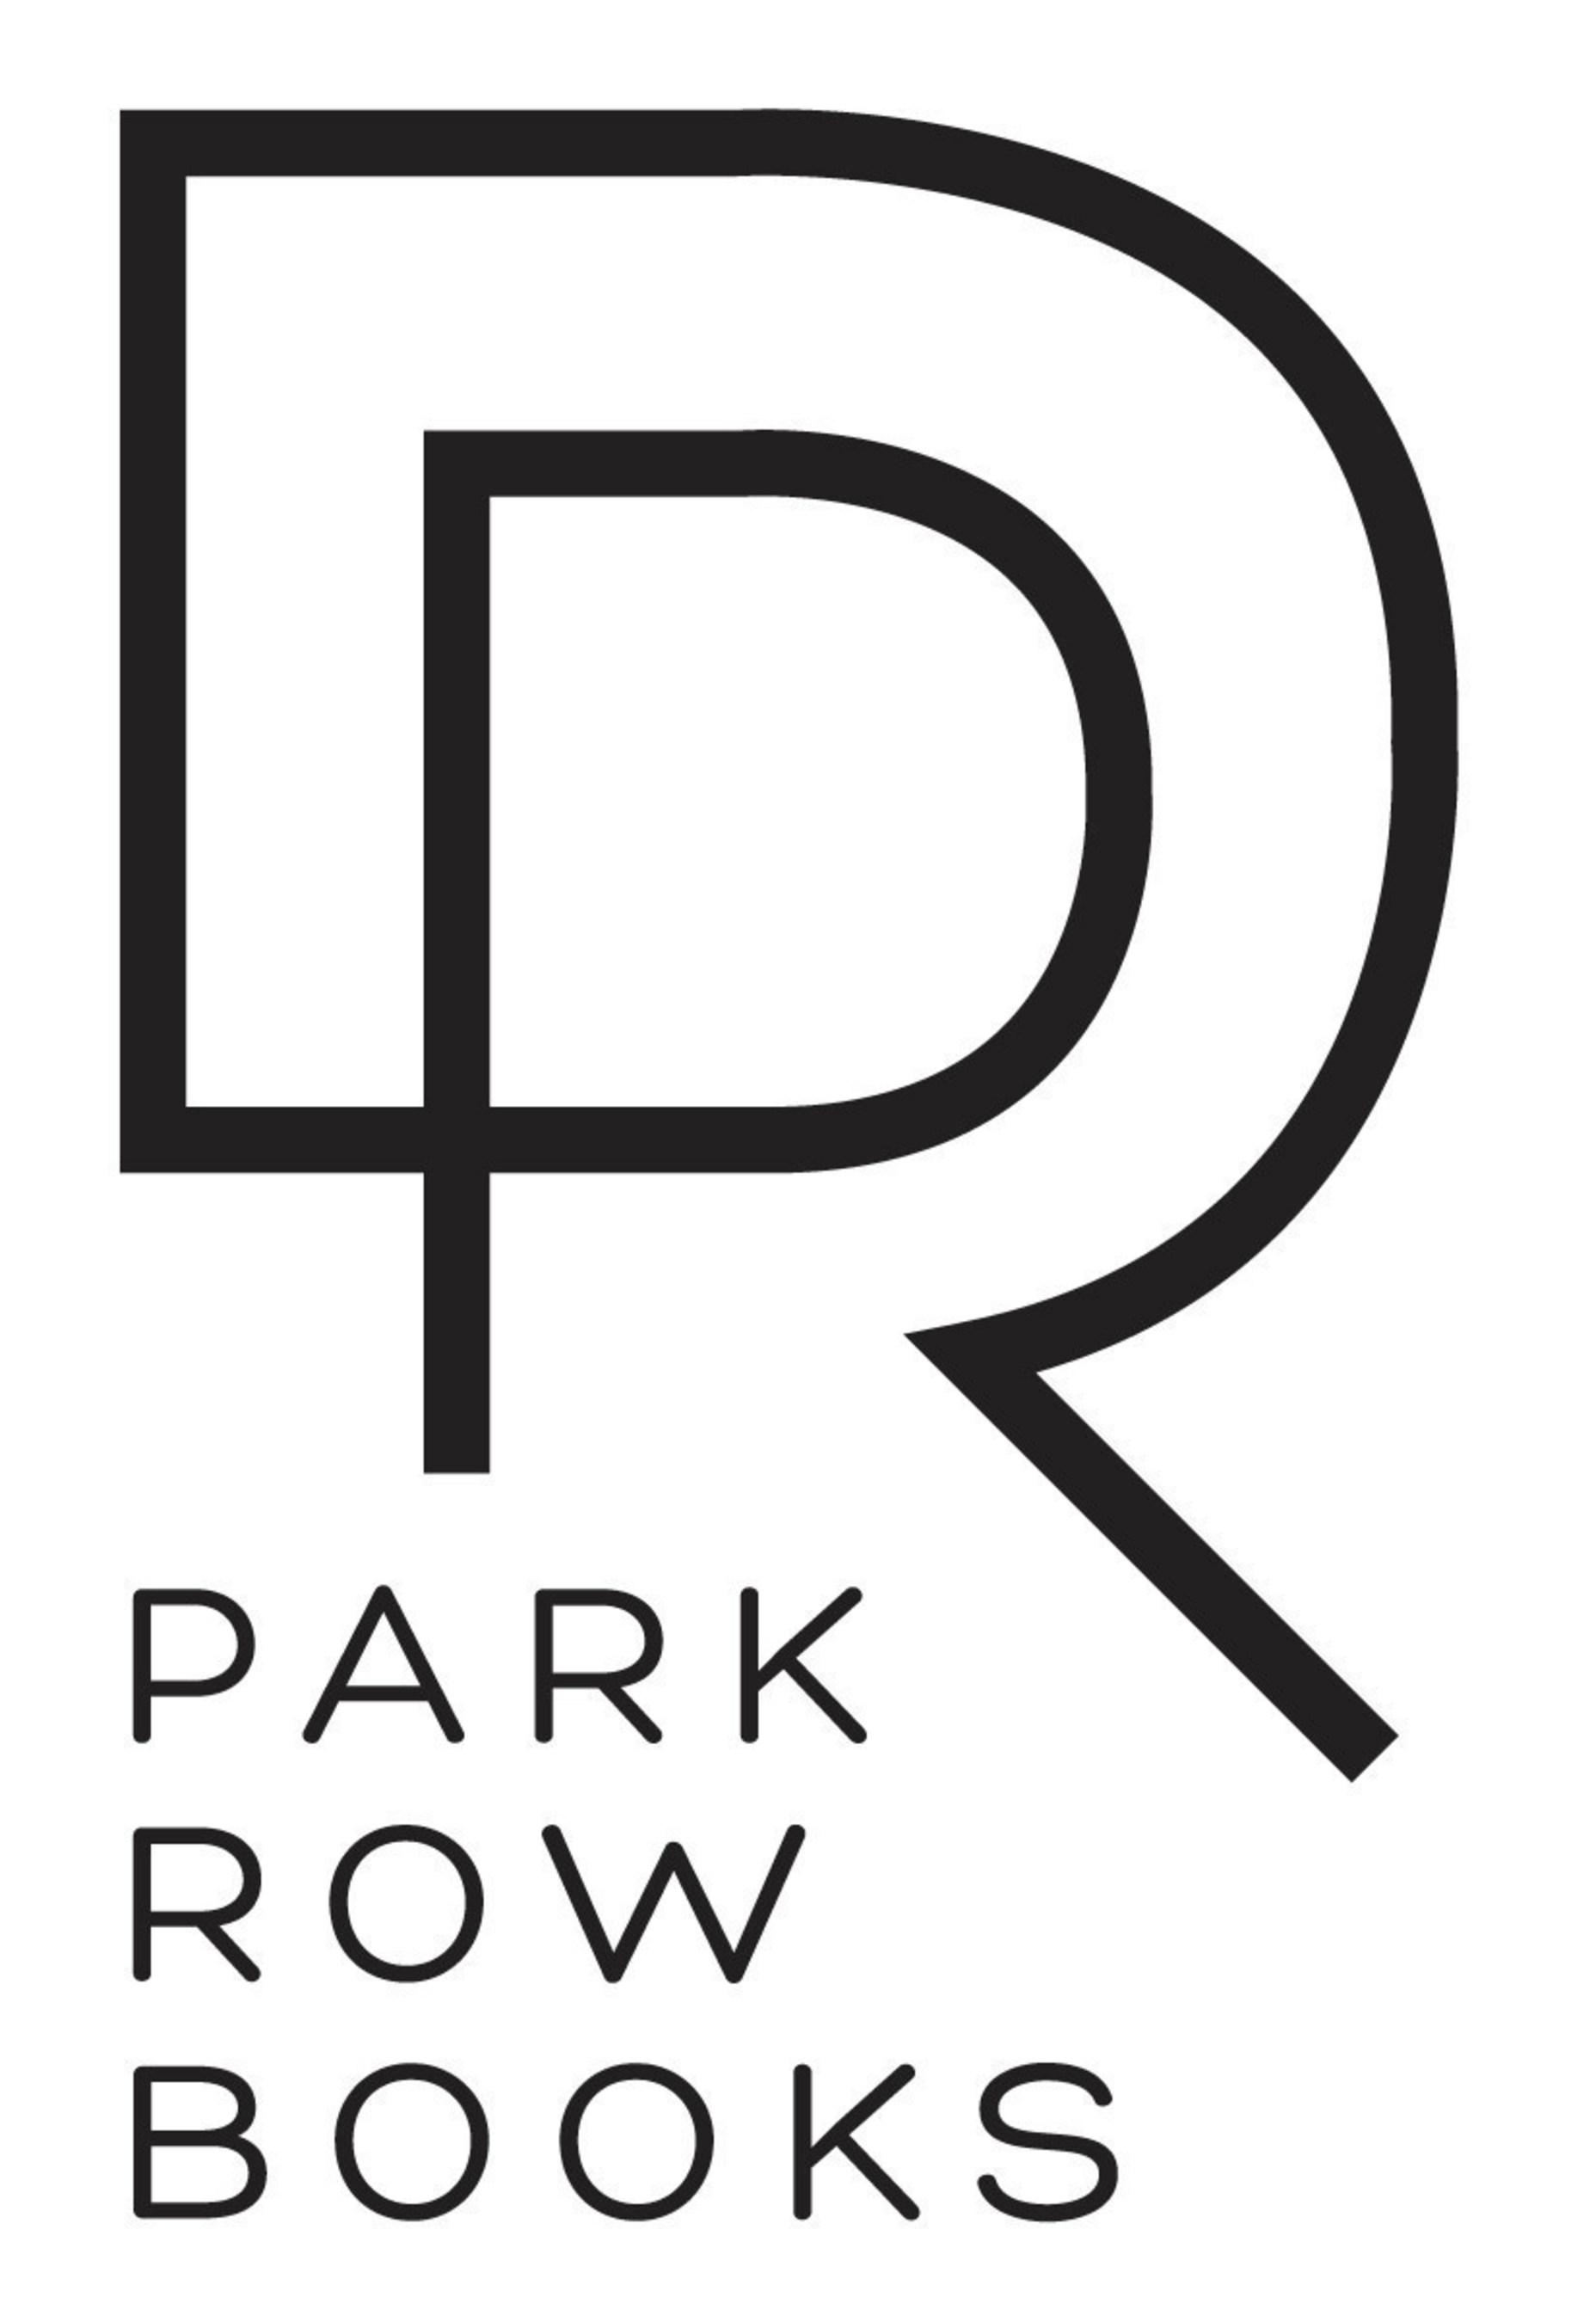 Introducing Park Row Books